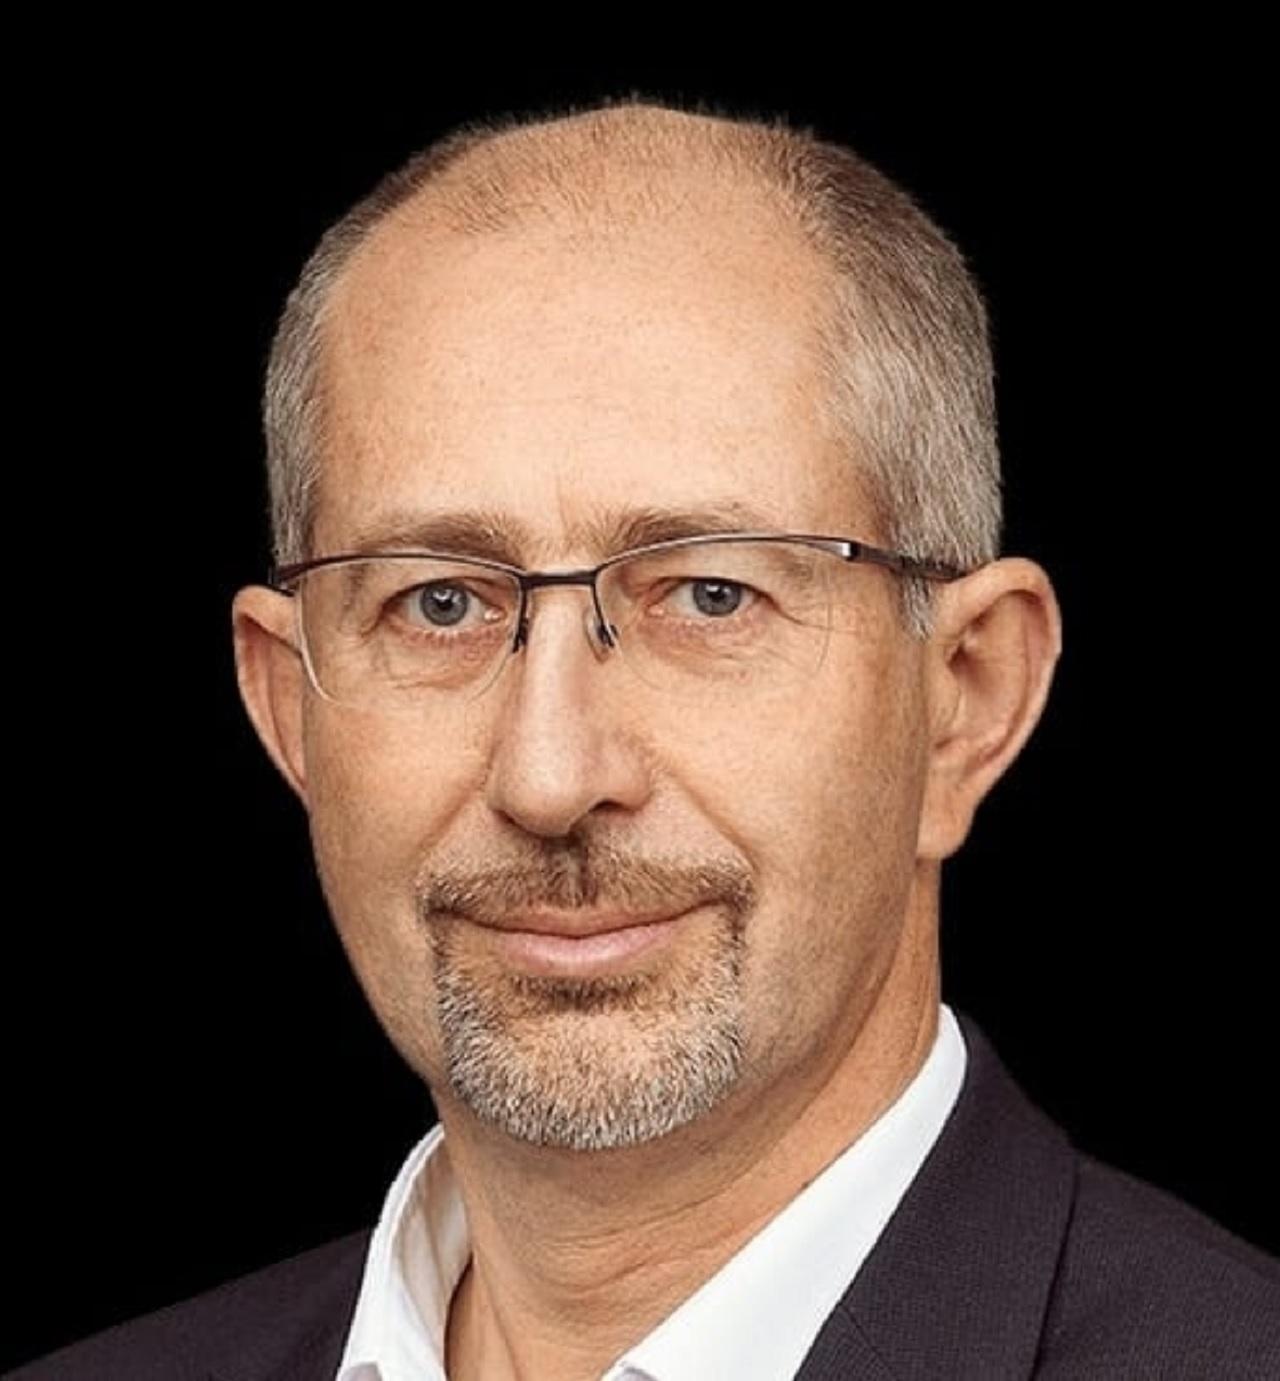 Peter Kremský